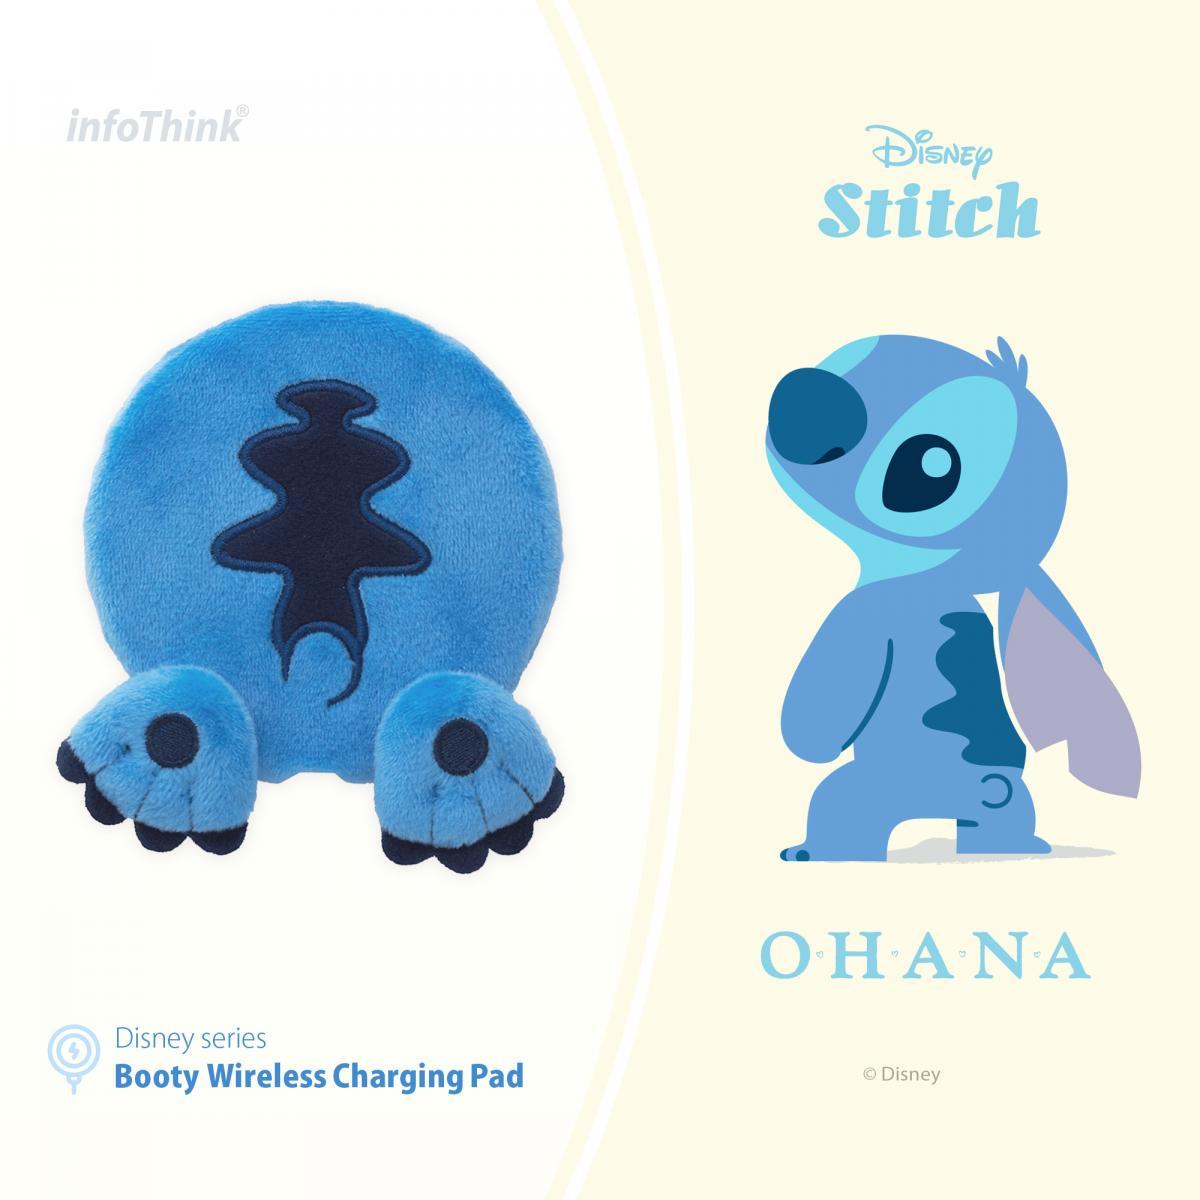 infothink booty wireless charging pad Stitch